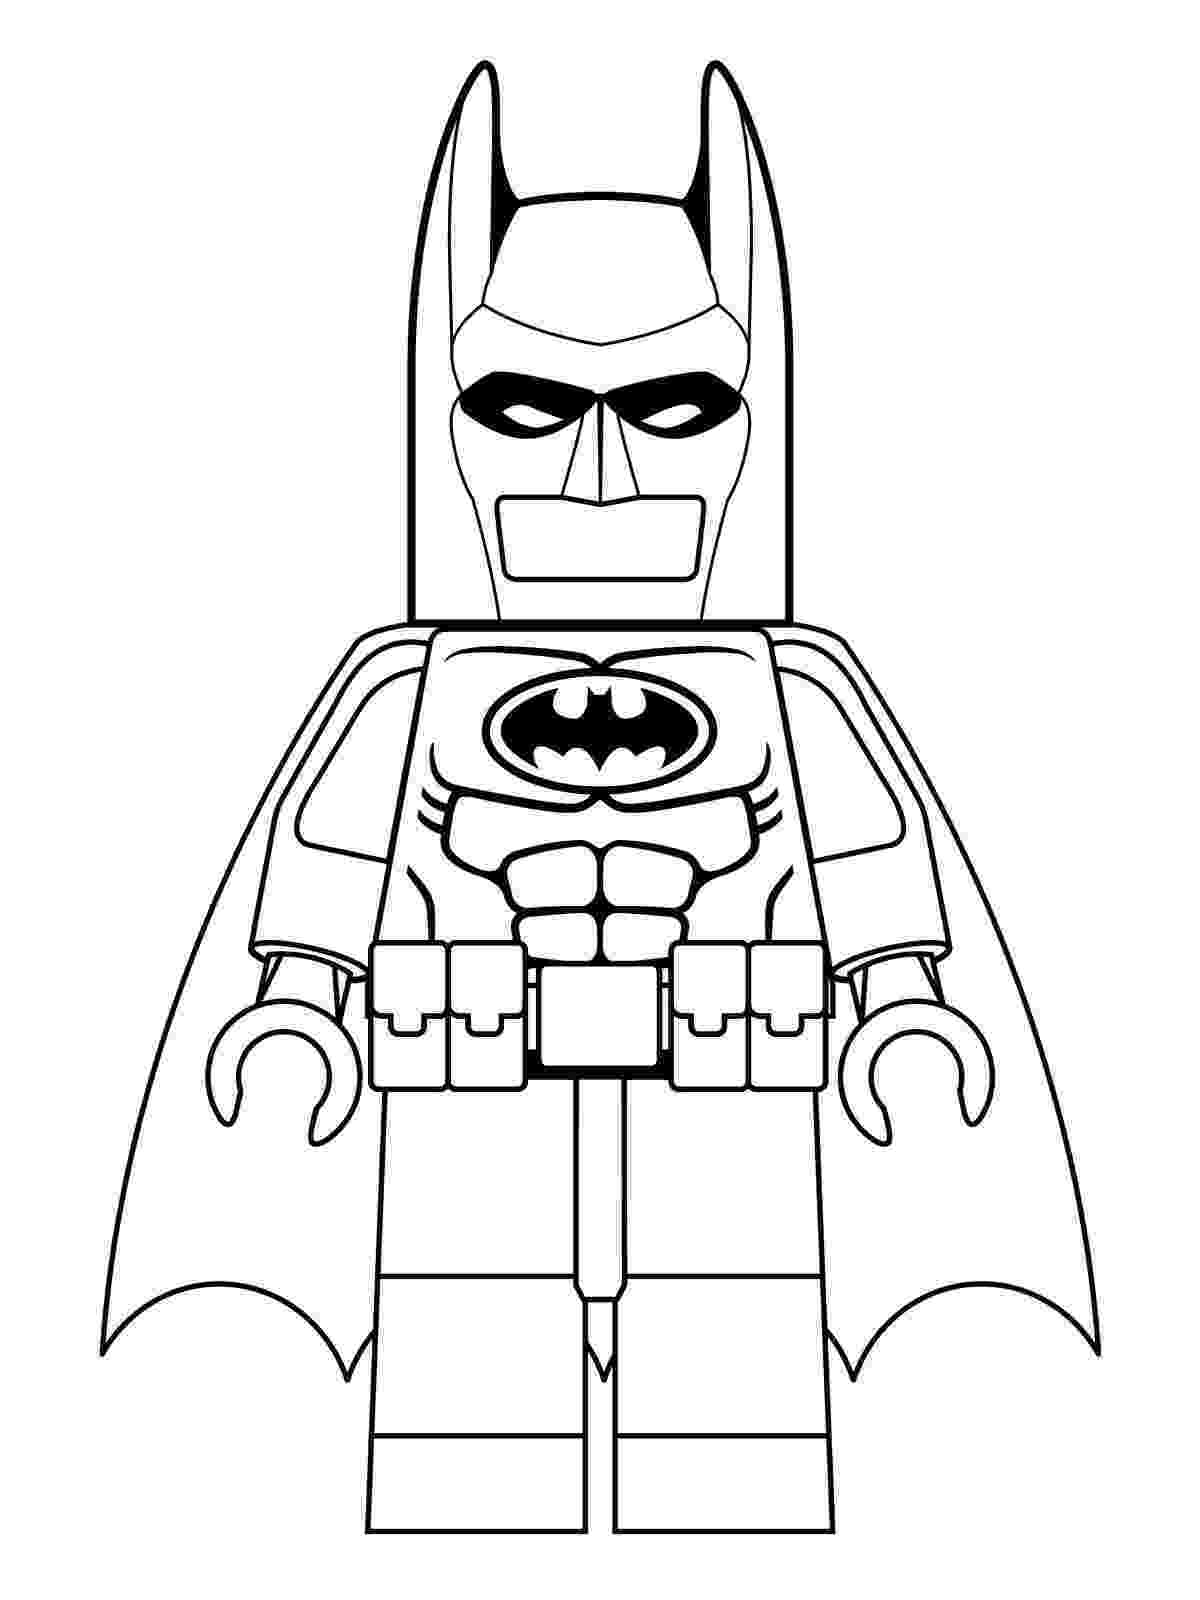 batman coloring pages for kids lego batman coloring pages best coloring pages for kids pages batman for coloring kids